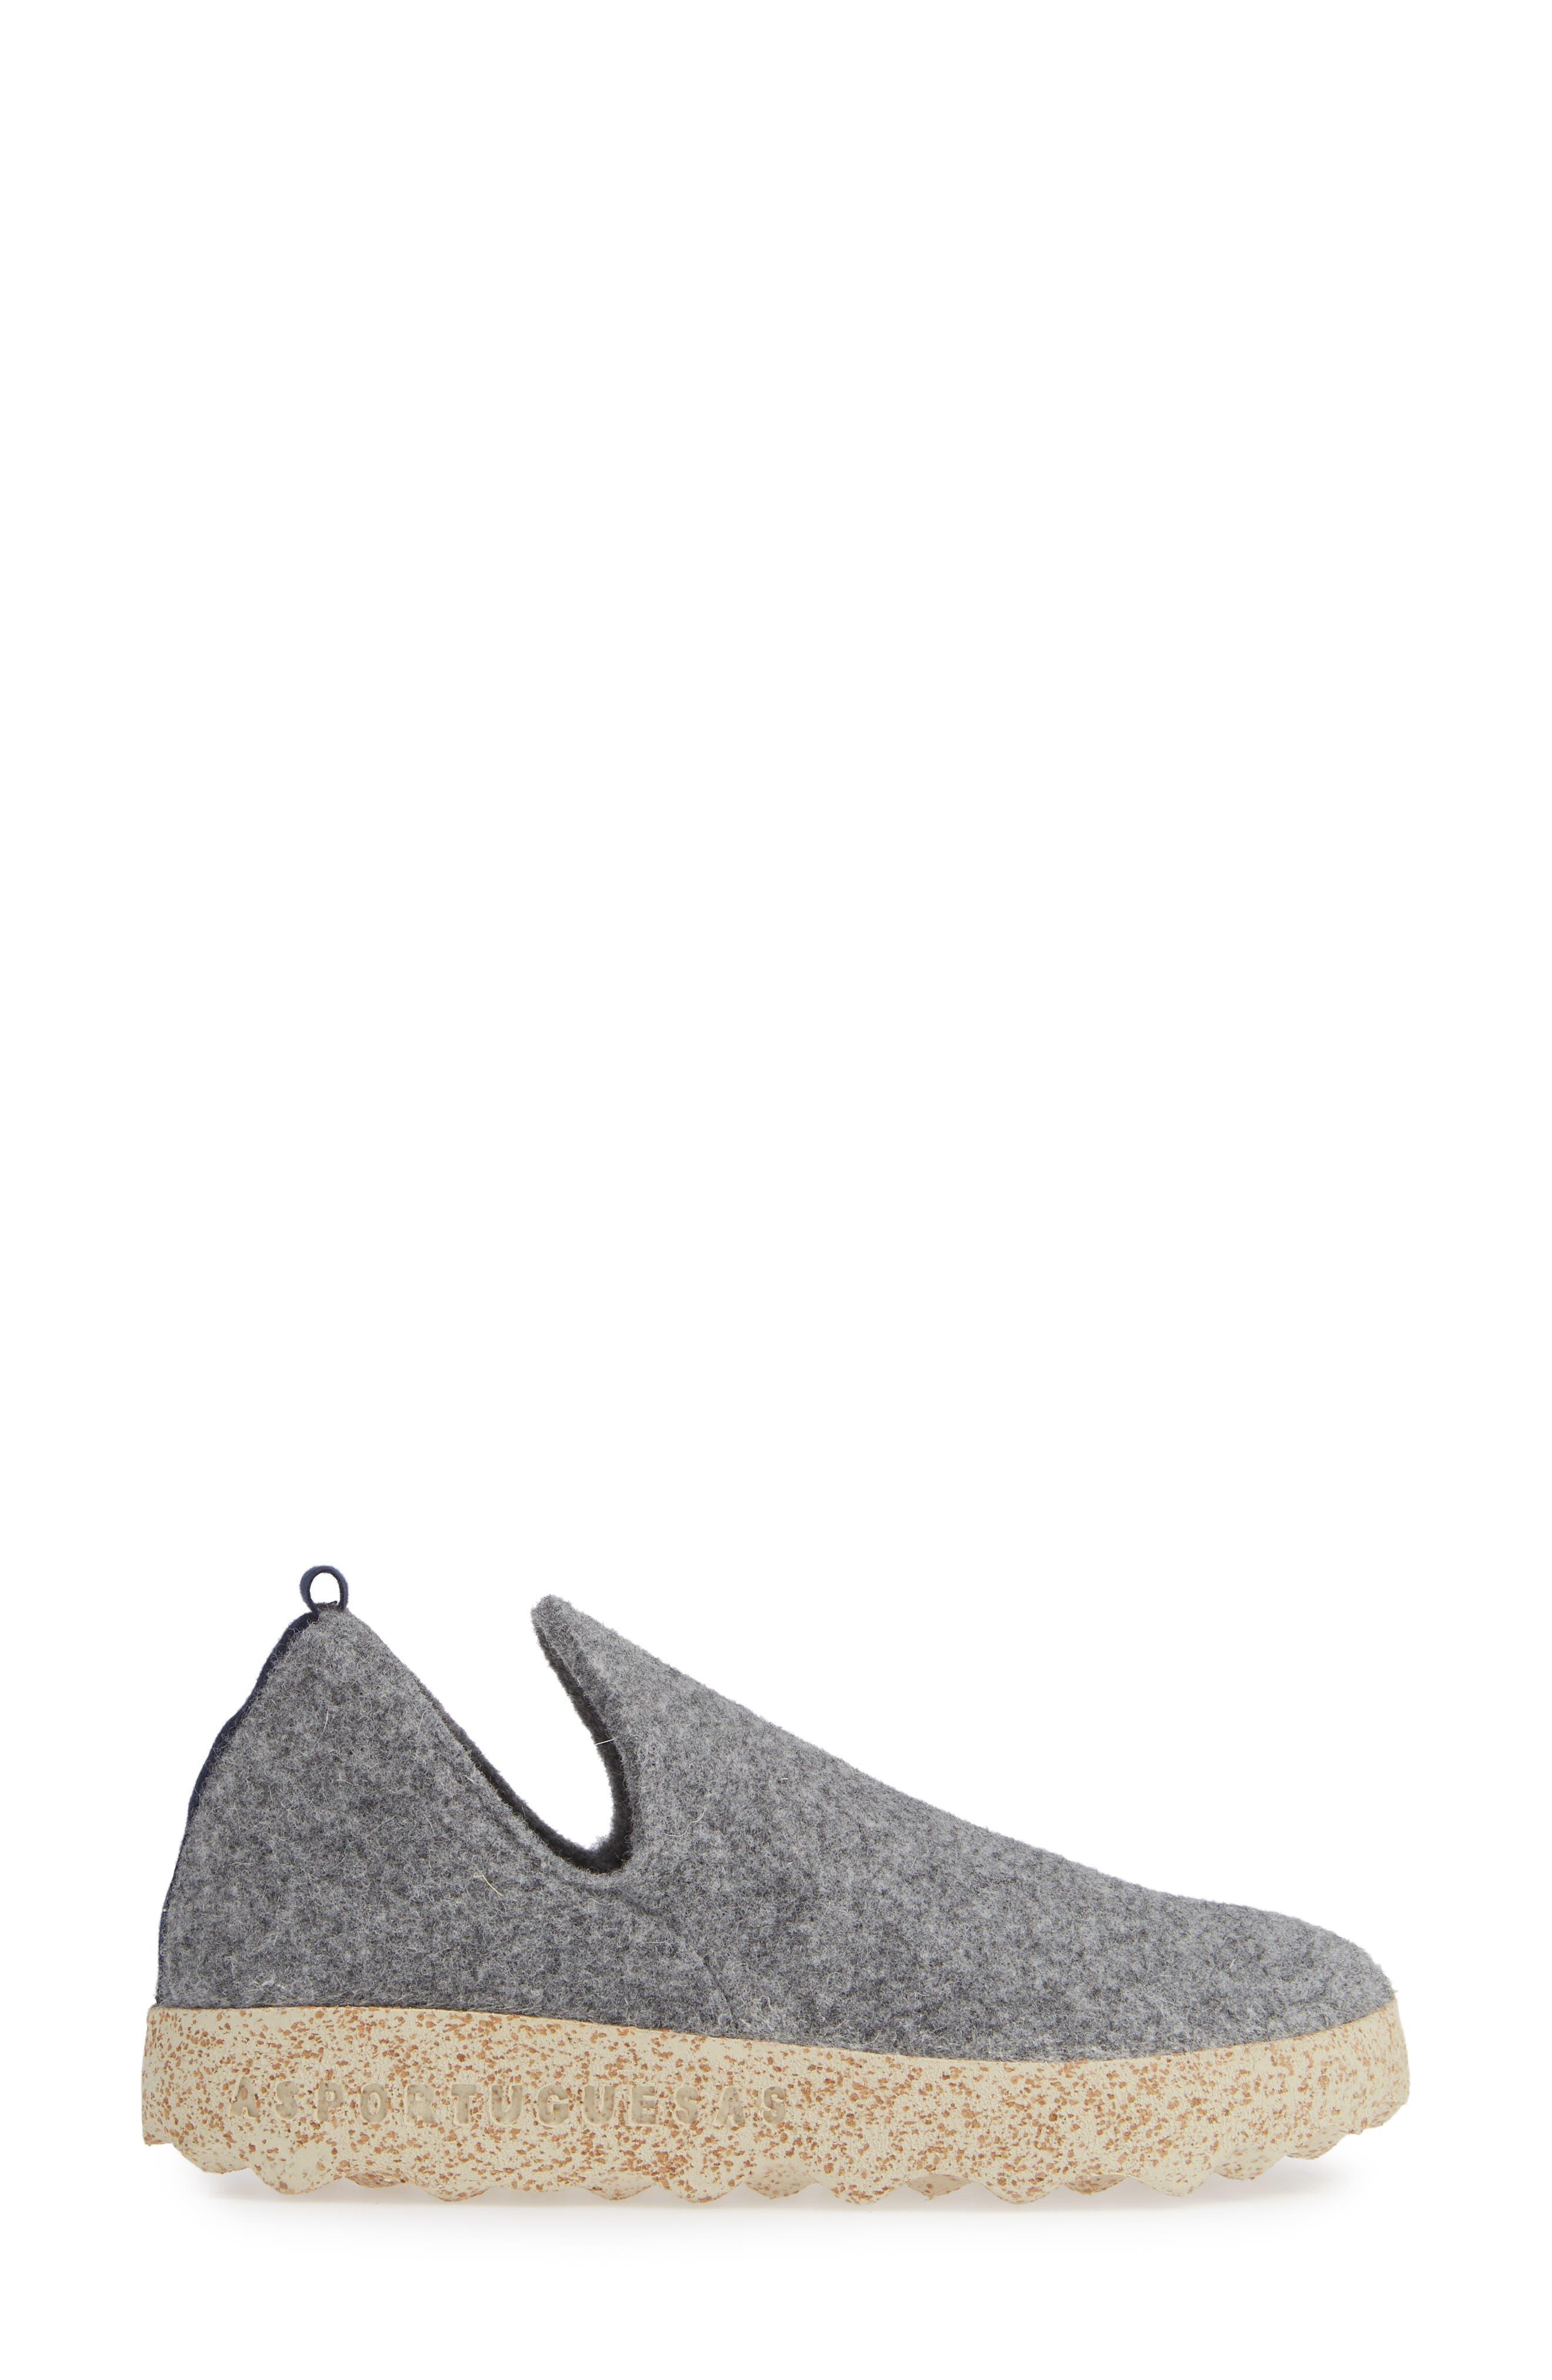 ASPORTUGUESAS BY FLY LONDON,                             City Sneaker,                             Alternate thumbnail 3, color,                             CONCRETE TWEED/FELT FABRIC